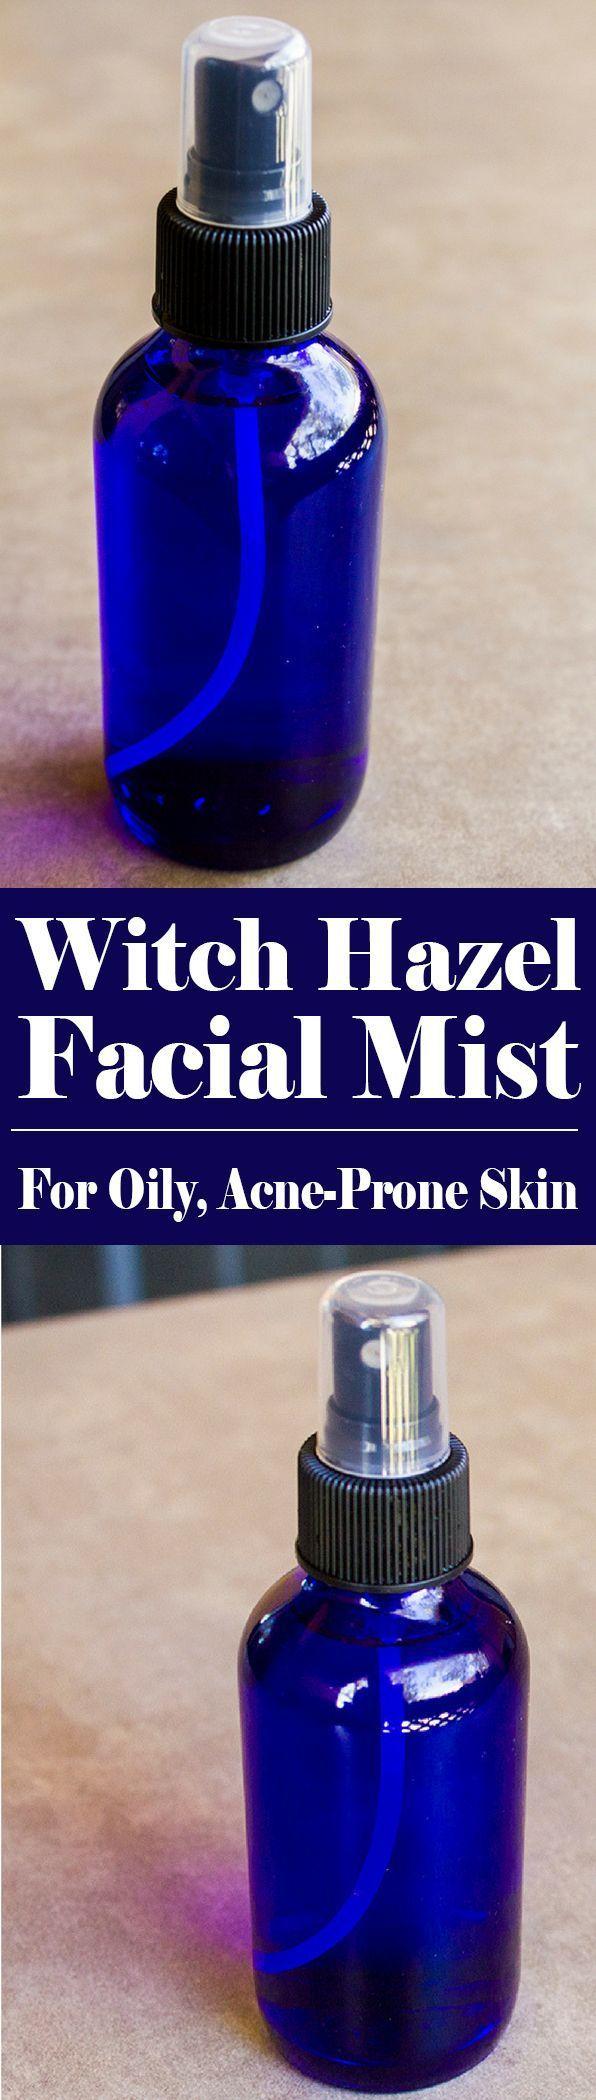 Witch Hazel Facial Mist Recipe Essential oils for face